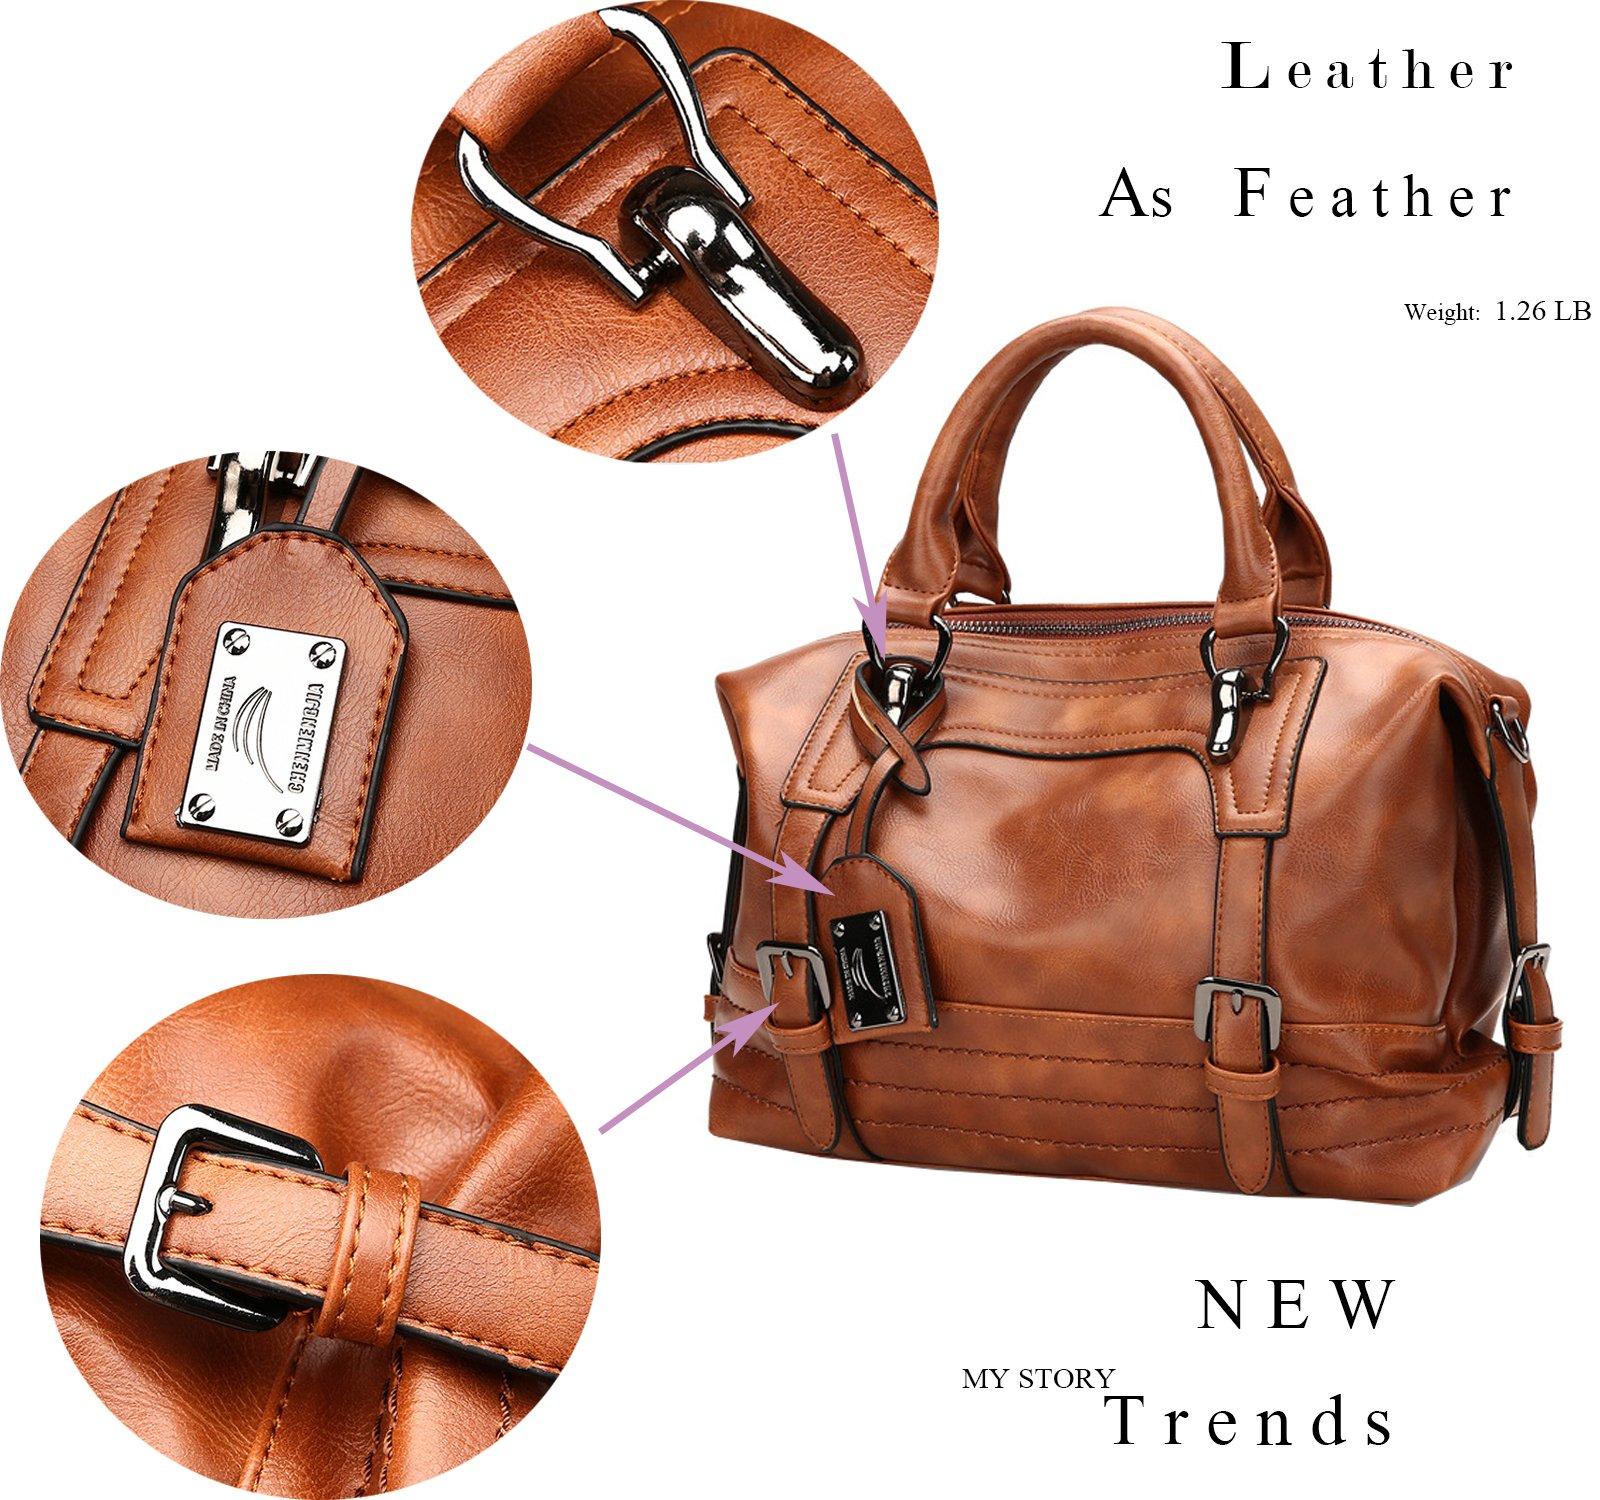 Juilletru Black Women Tote Bags PU Leather Handbags Top Handle Vintage Purse Crossbody Shoulder Bag by Juilletru (Image #2)